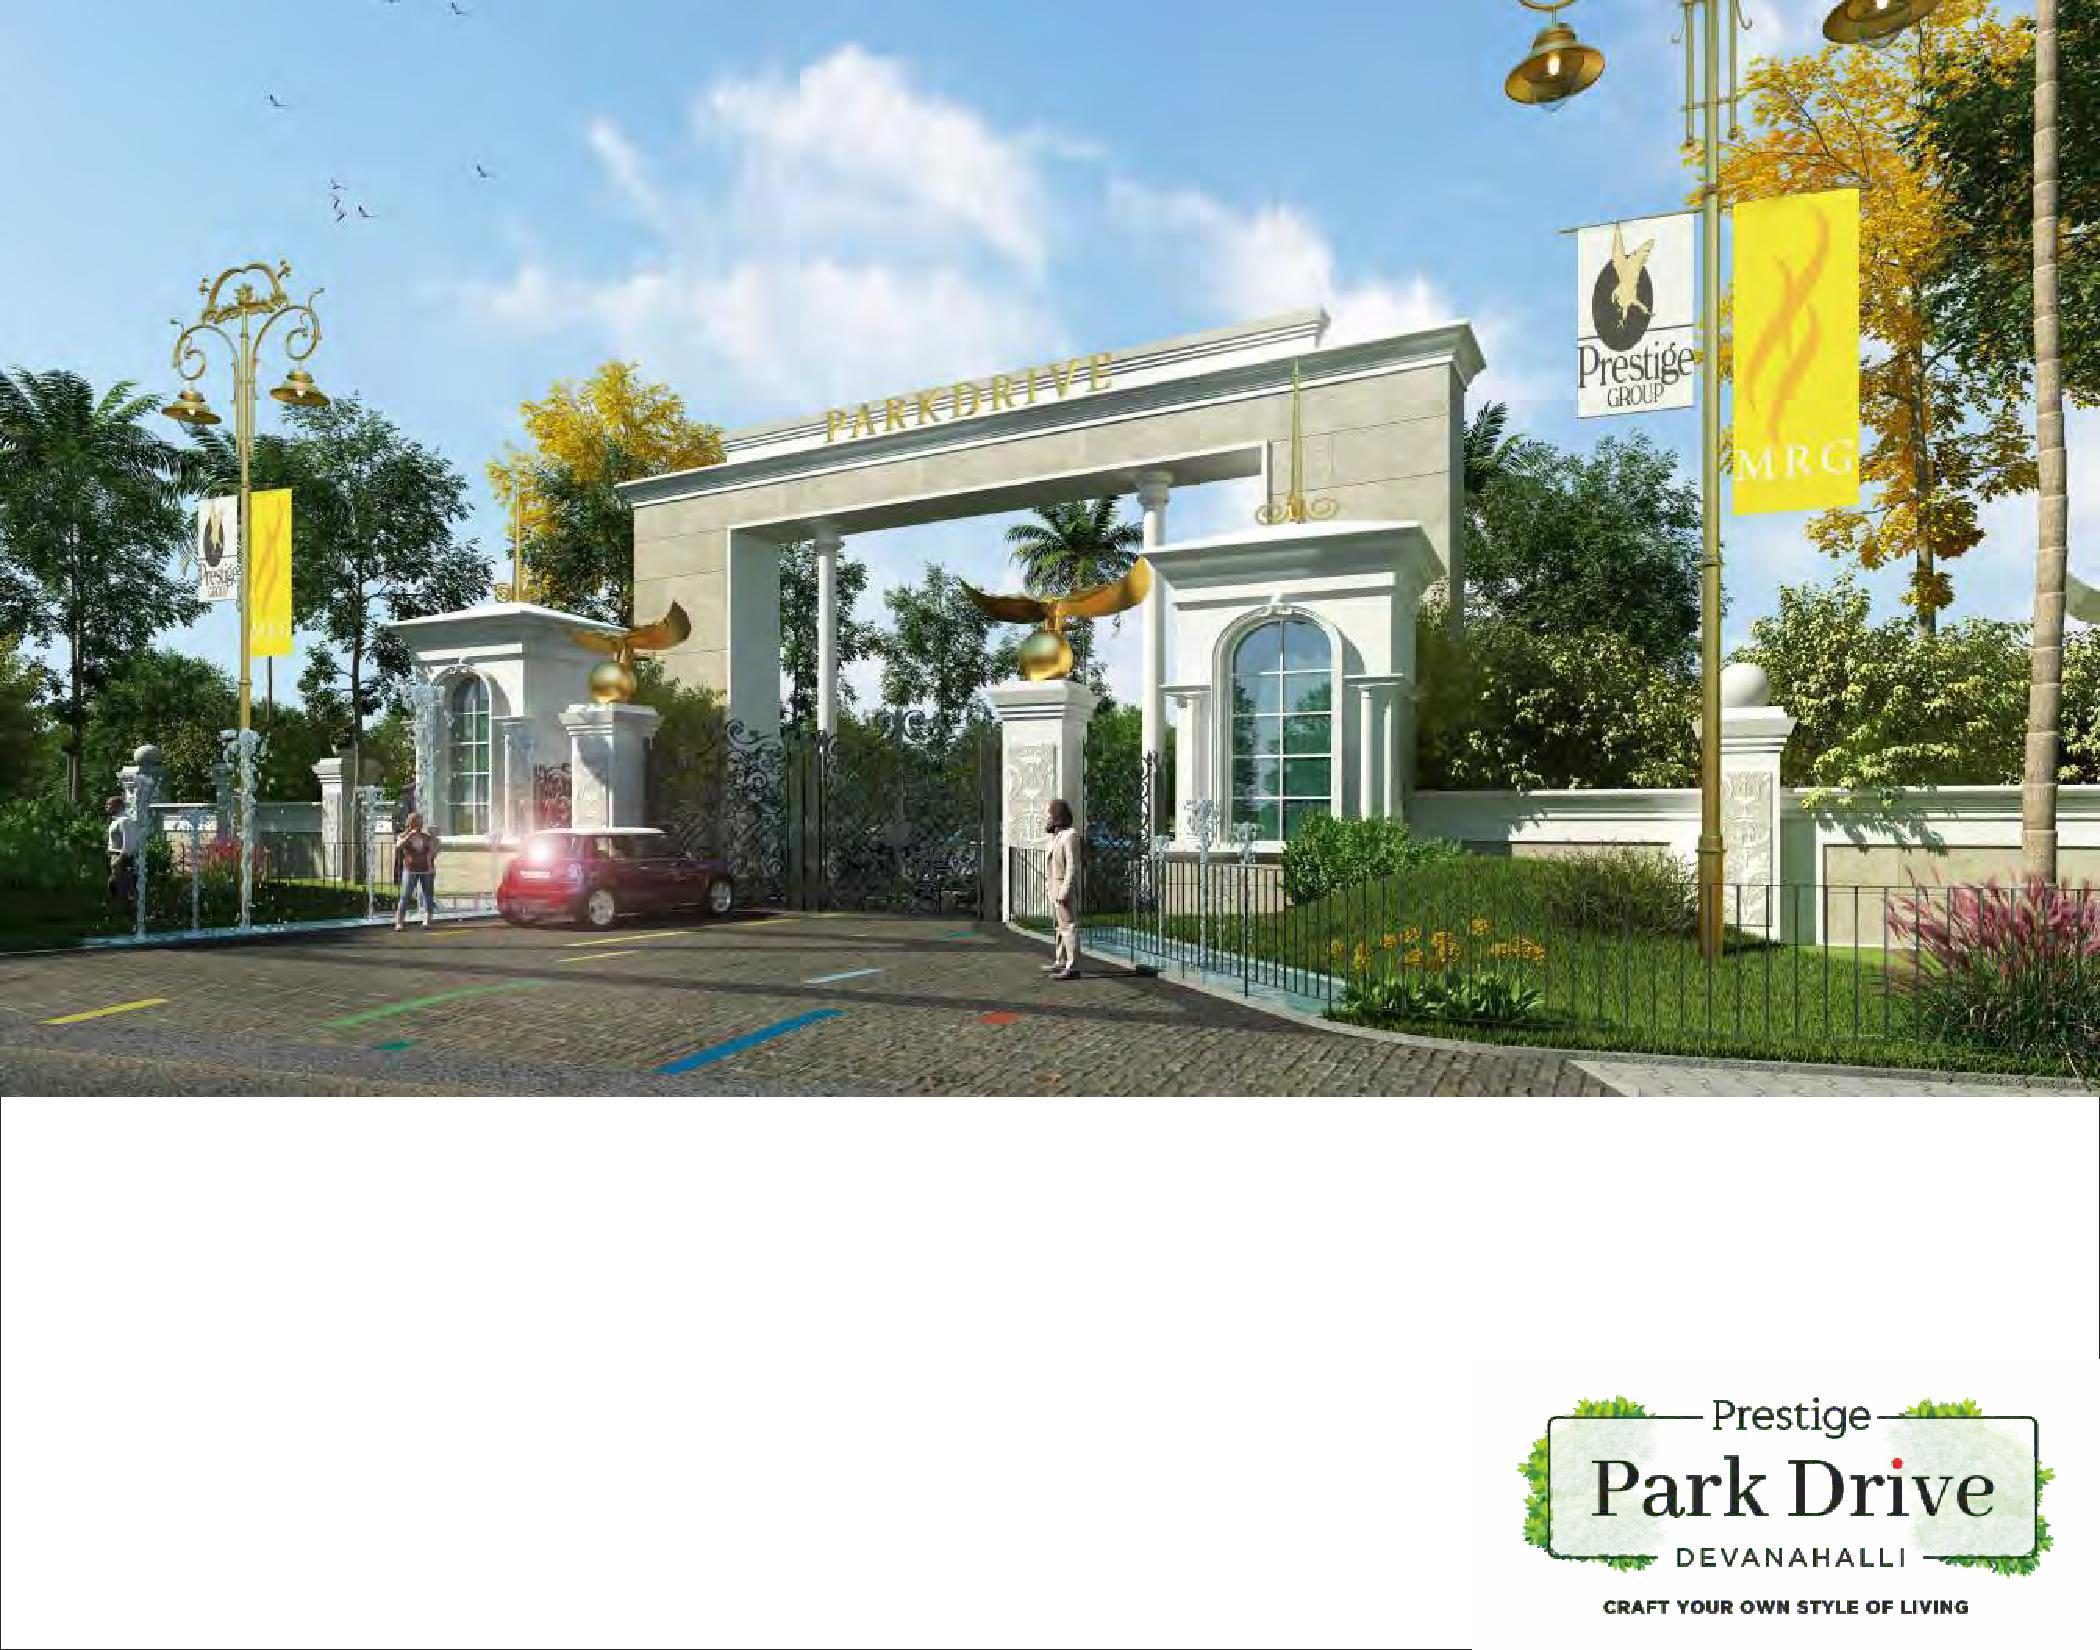 Prestige-Park-Drive-Plot-in-Devanahalli-Bangalore-Image-02